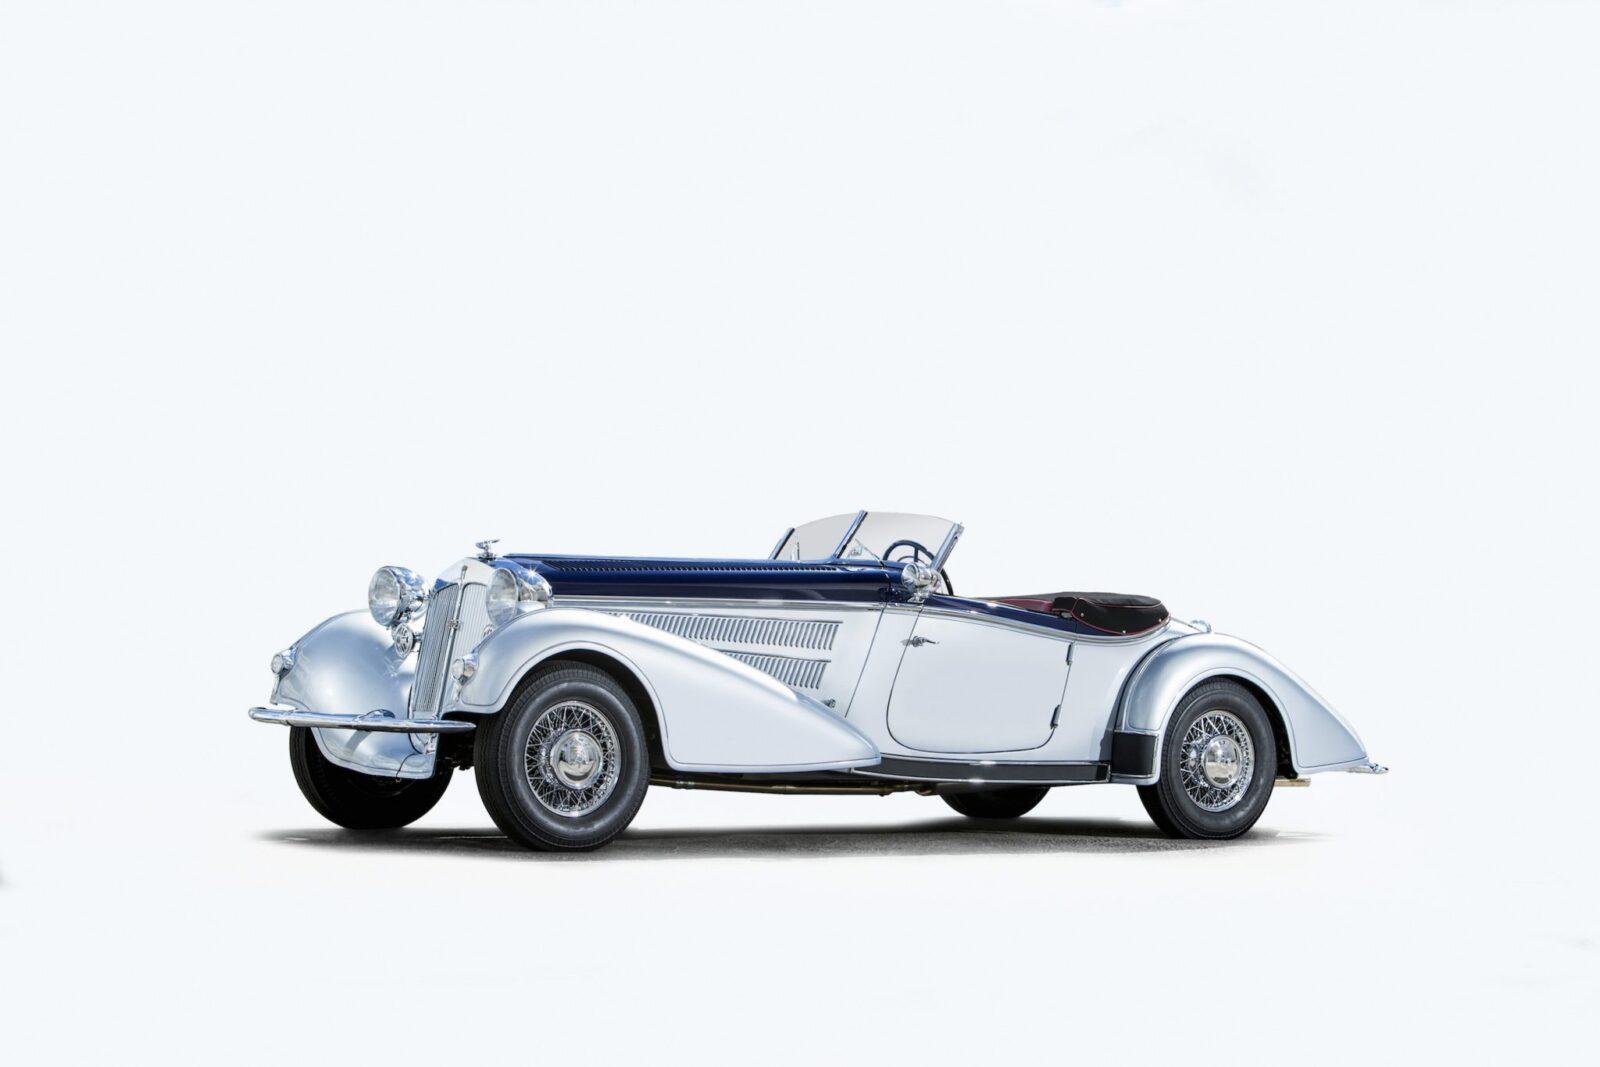 Horch 853 Spezialroadster 1600x1067 - 1936 Horch 853 Spezialroadster